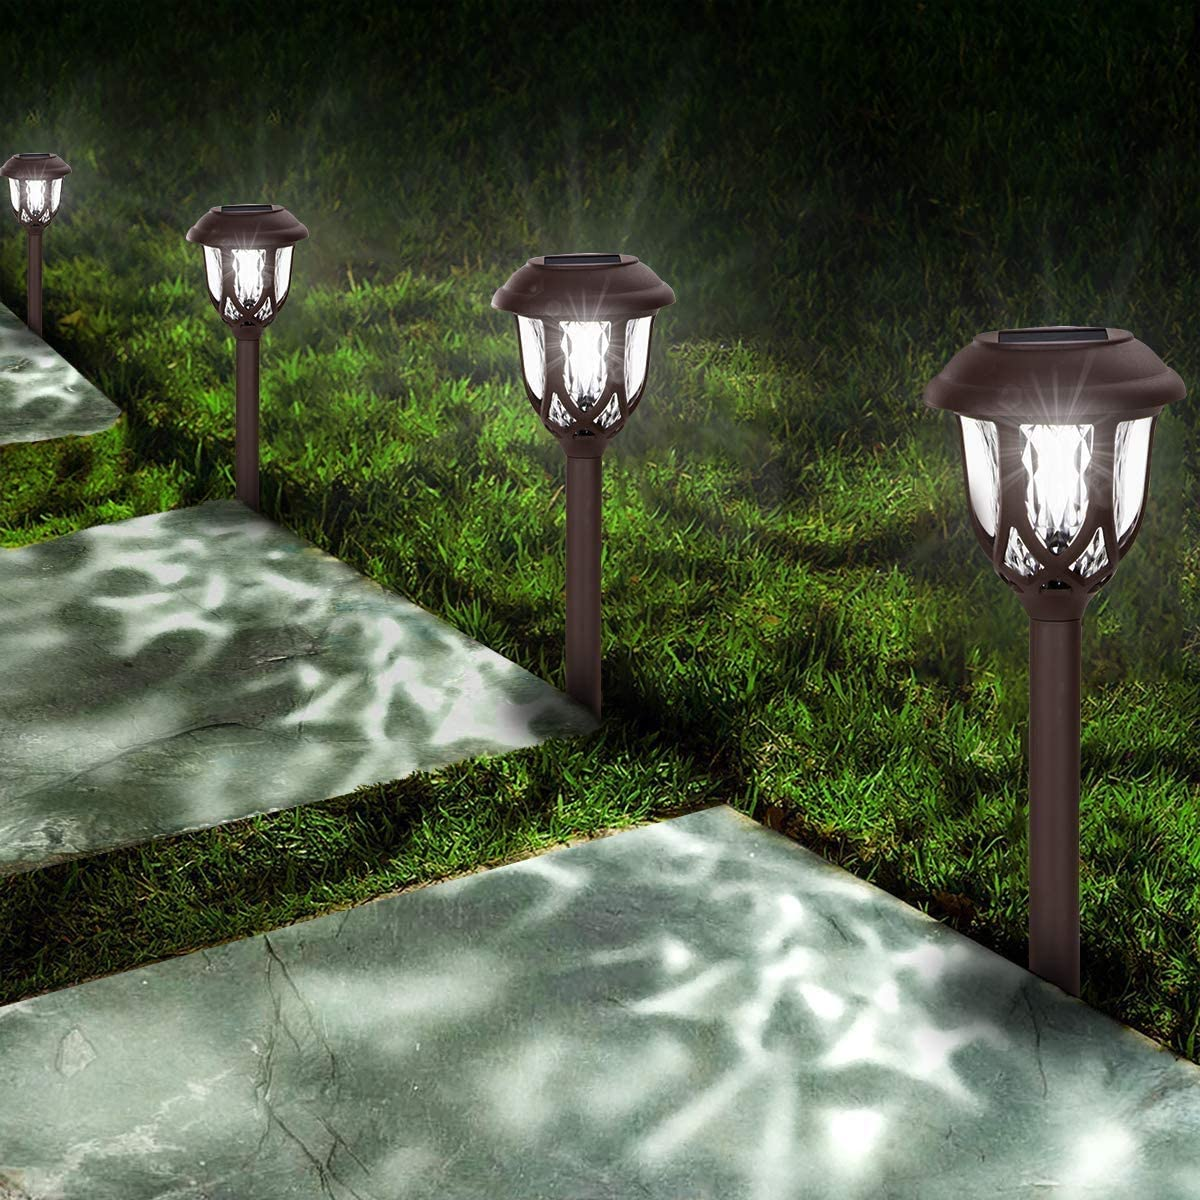 Solar Lights Outdoor Decorative,10 Packs Solar Pathway Lights,Powered Landscape Lighting,Waterproof Solar Powered Garden Yard Lights for Walkway Sidewalk Driveway-Cool White